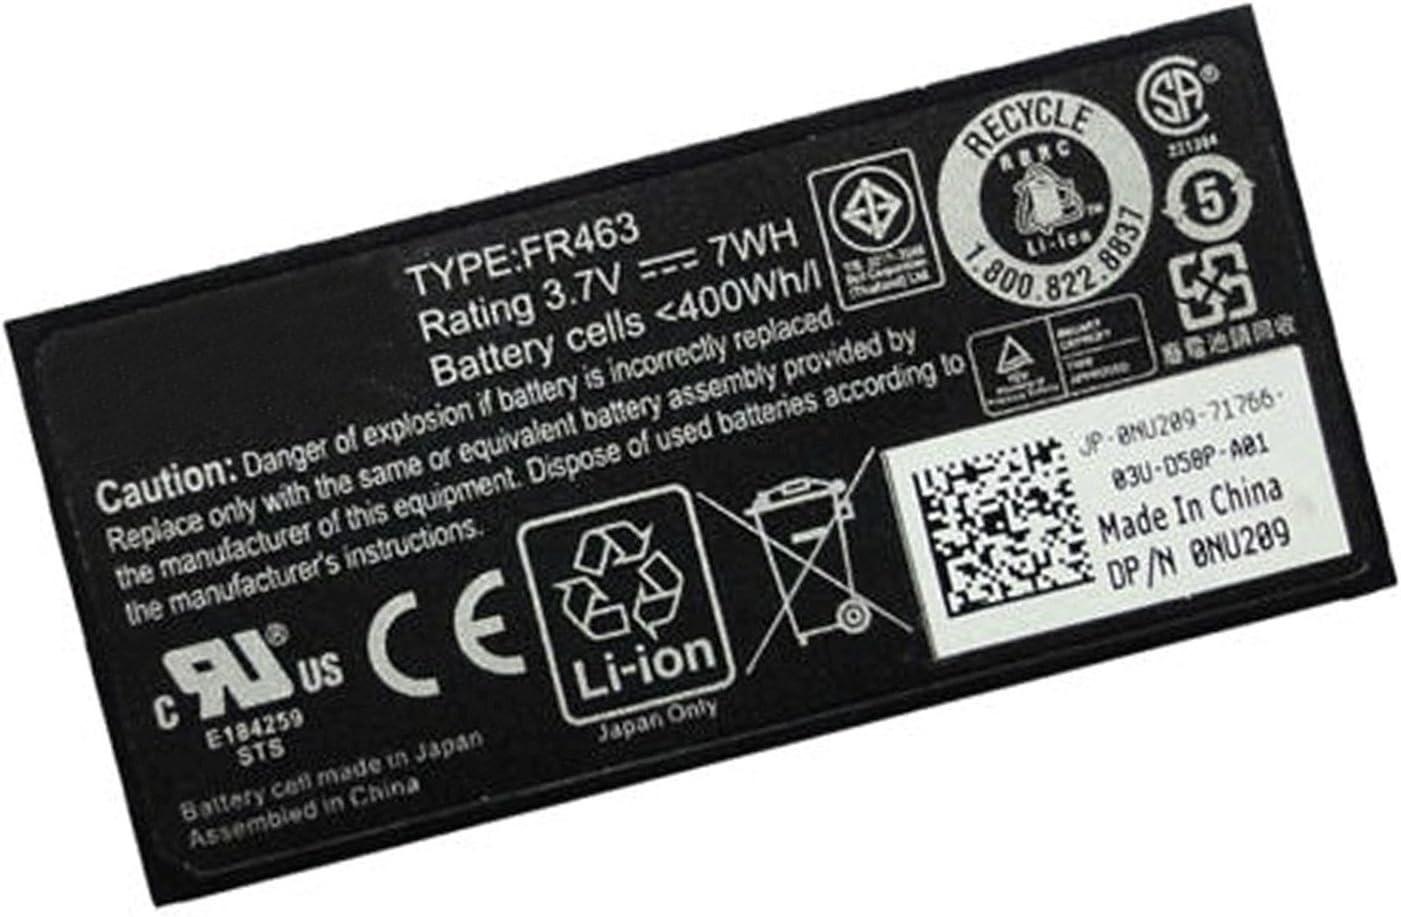 Dentsing FR463 Battery for Dell Poweredge Perc 5i 6i PowerEdge 1950 2900 2950 P9110 NU209 U8735 XJ54 312-0448 / 0NU209